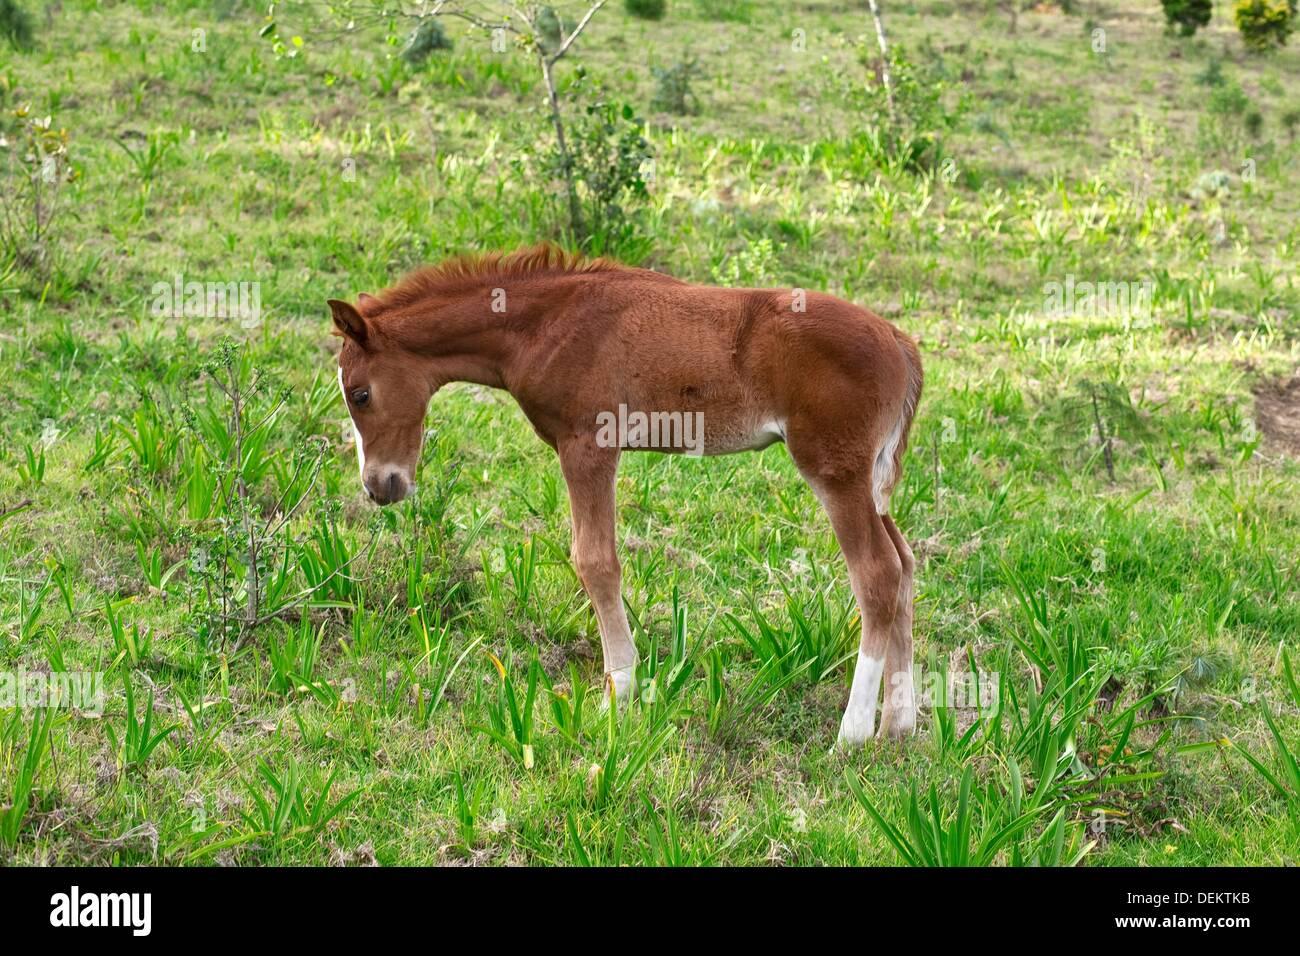 Newborn Colt 2 Months Old Stock Photo Alamy